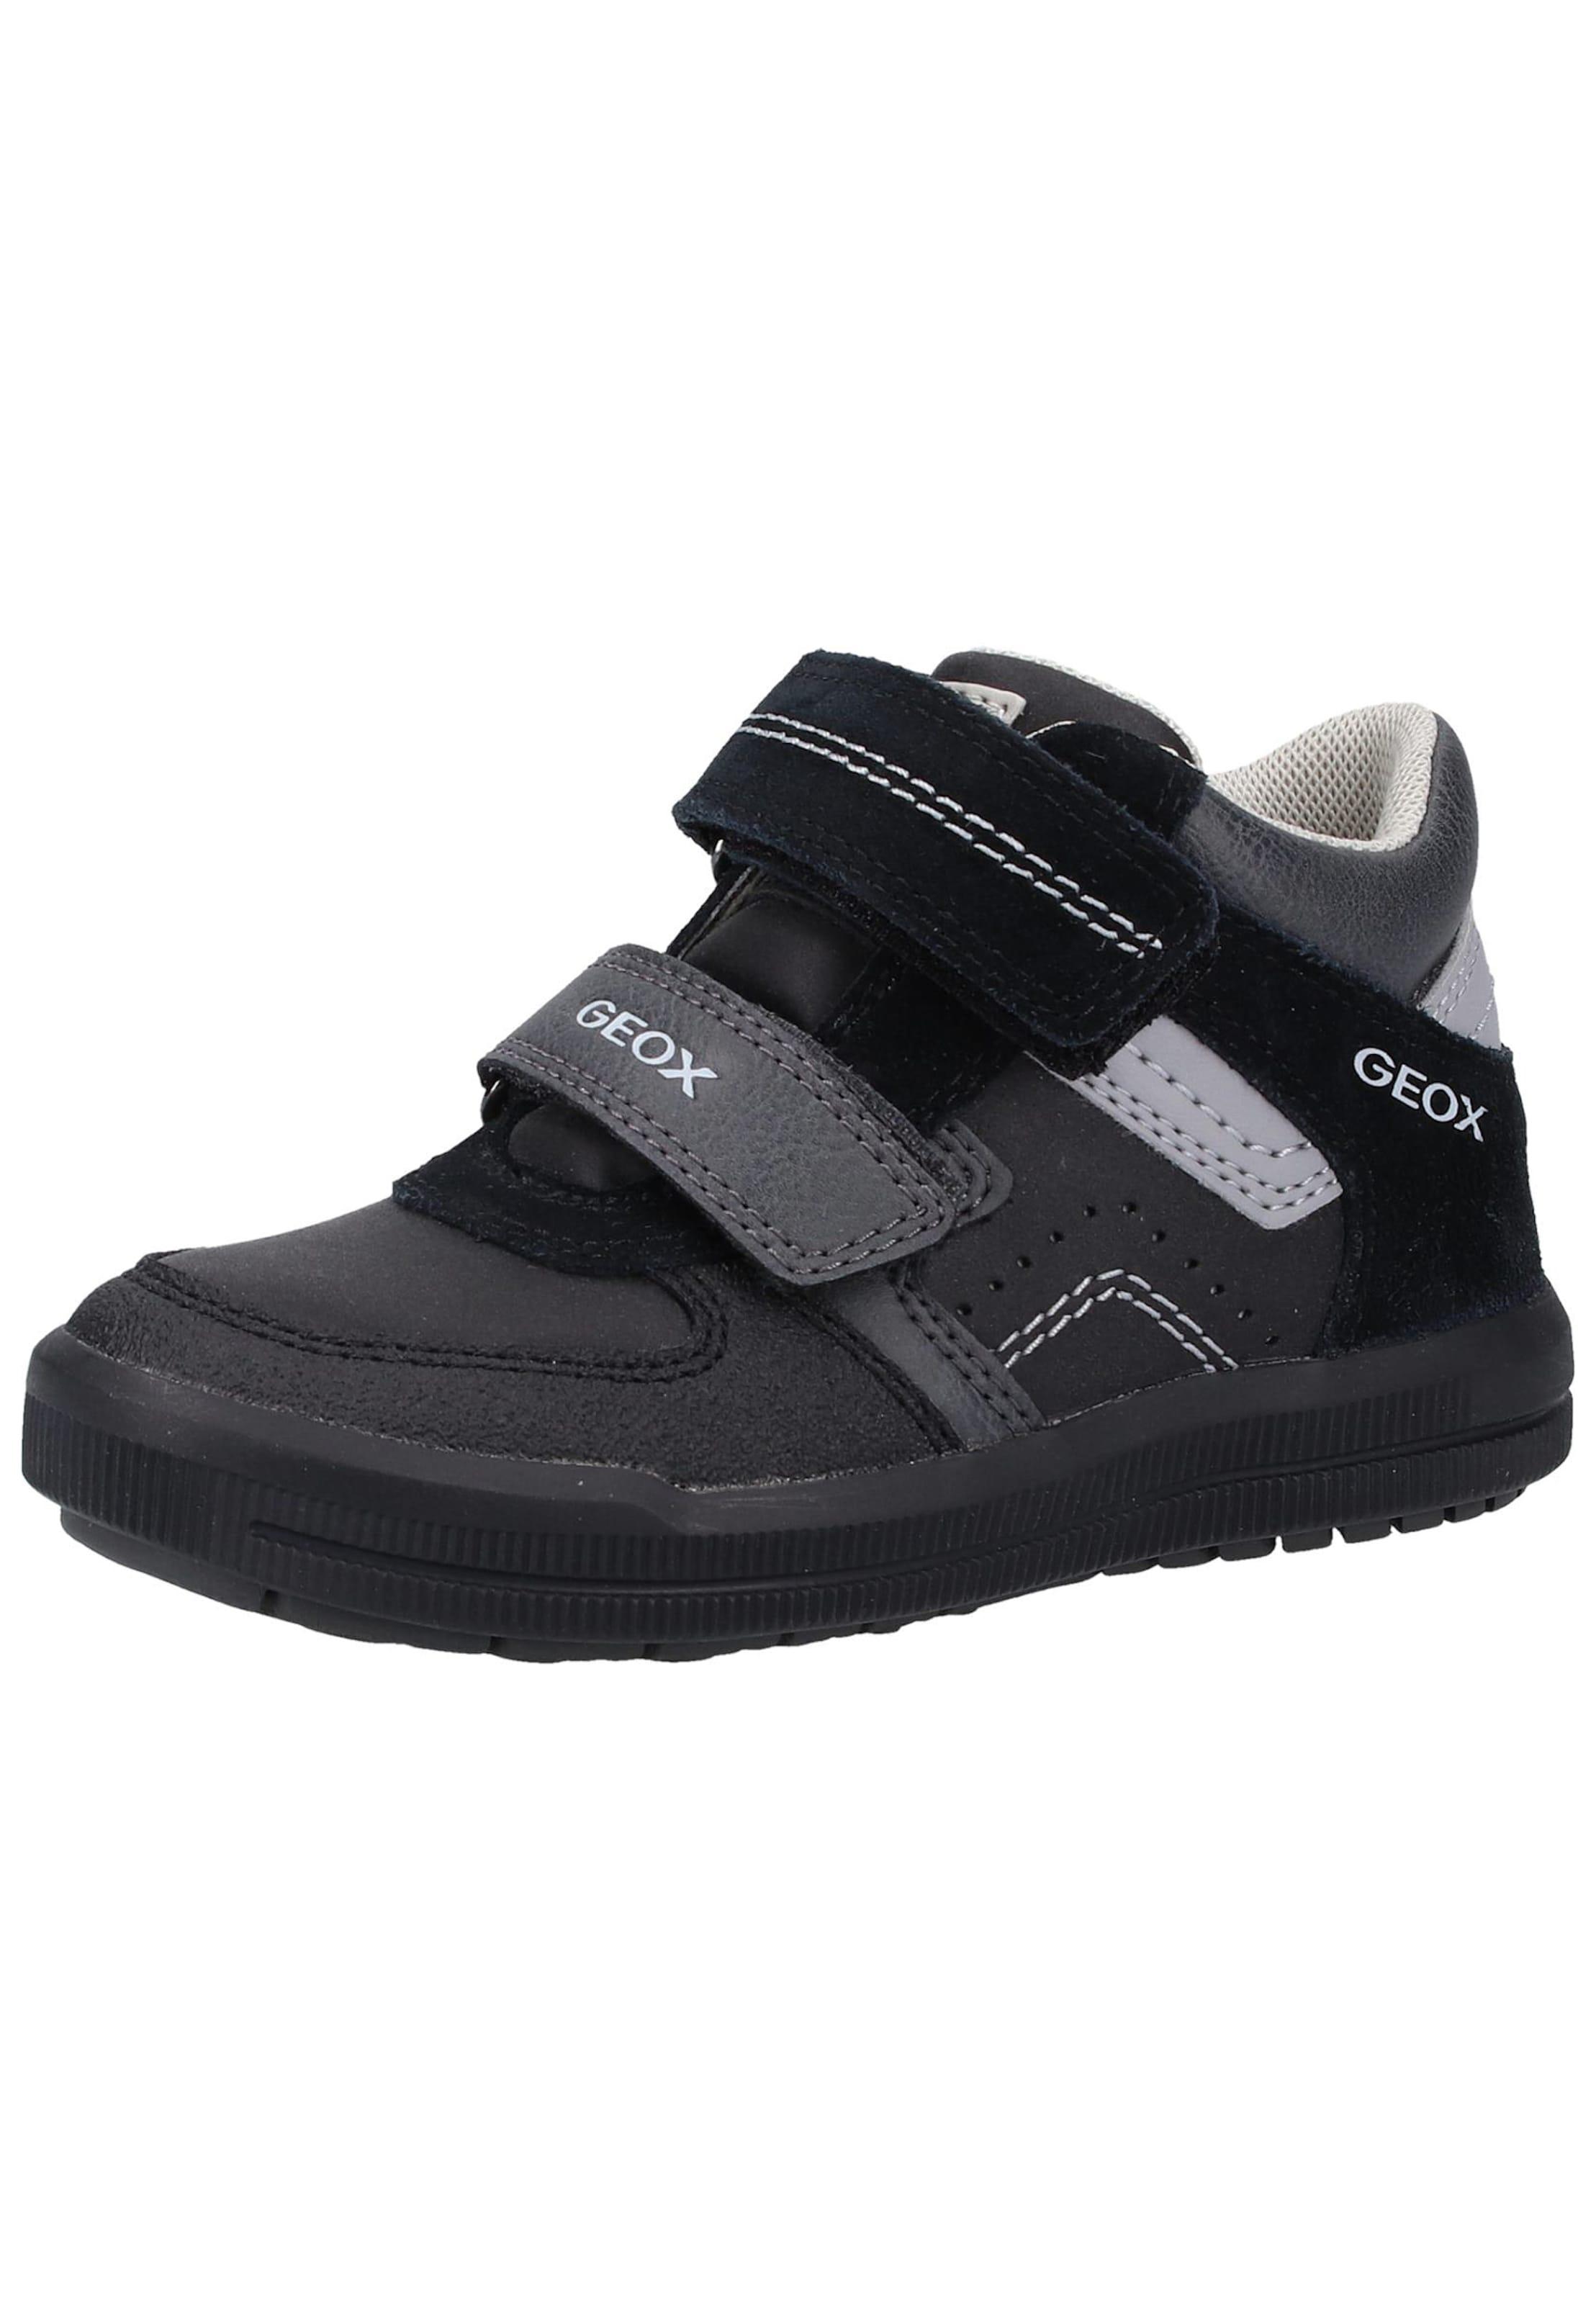 Jungen,  Kinder,  Kinder Geox Sneaker aqua,  blau,  blau, bunt,  mehrfarbig, grau,  schwarz, khaki | 08054730226478